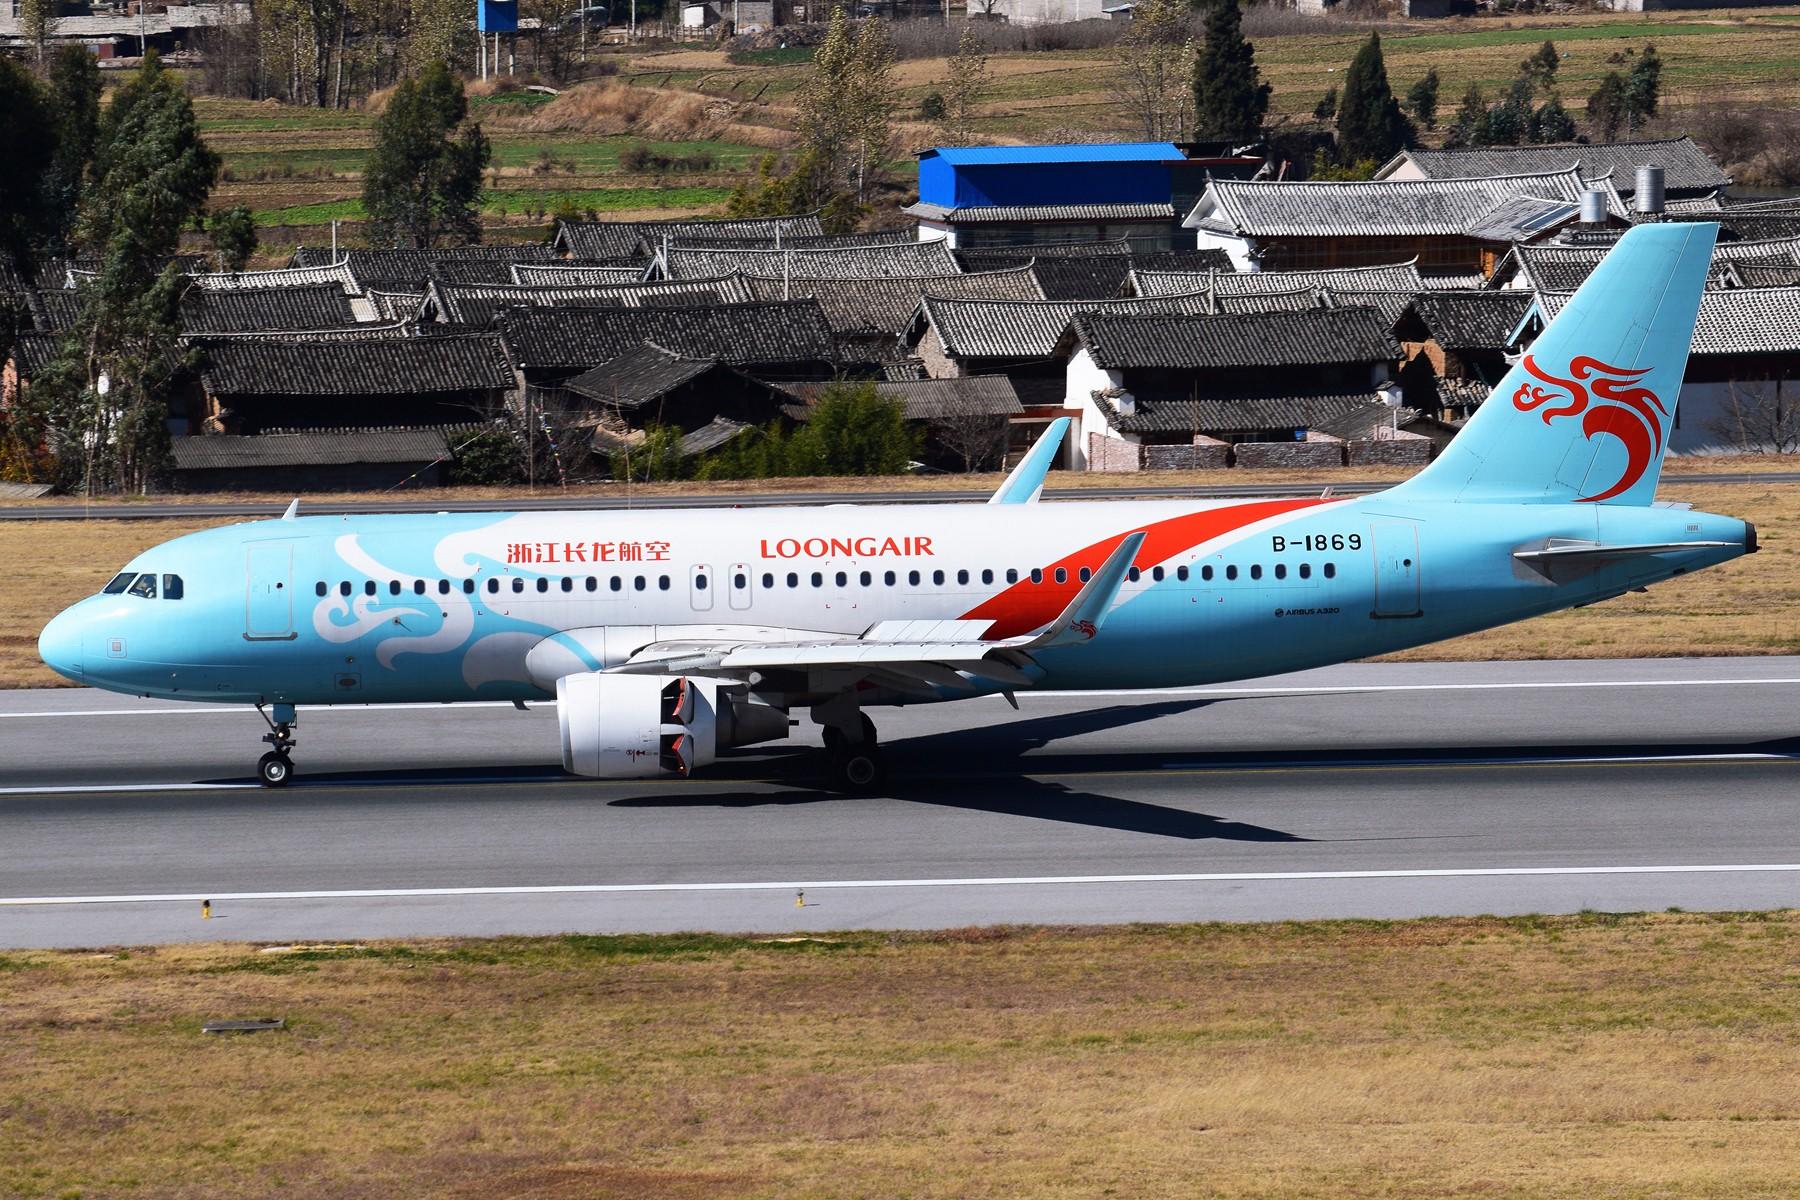 Re:[原创]补发的拍机游记---Day Trip for 丽江三义 AIRBUS A320-200 B-1869 中国丽江三义机场